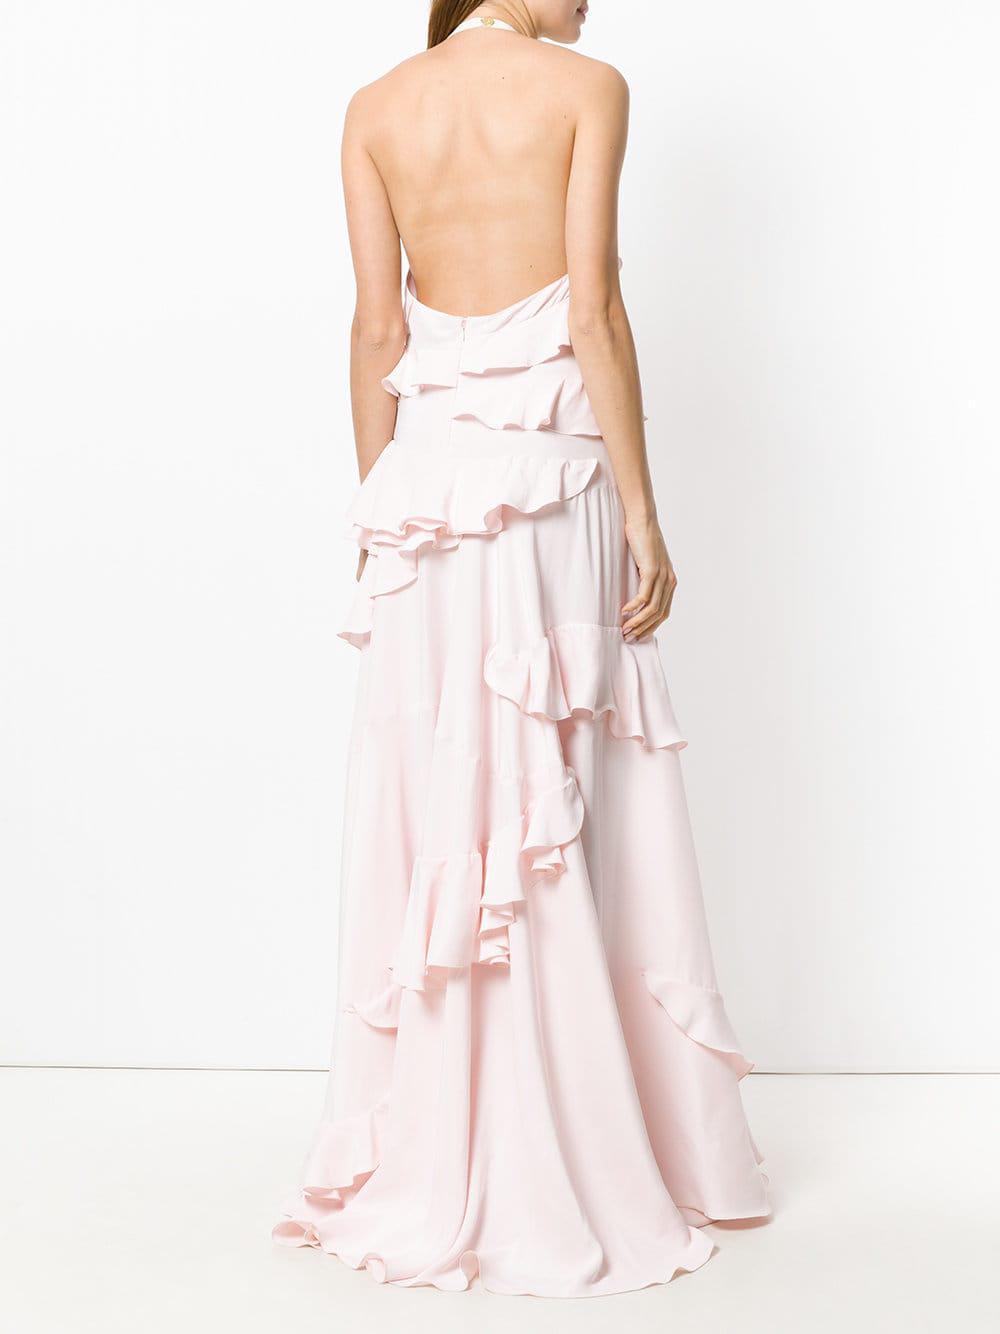 deb7adad38967 Maison Rabih Kayrouz - Pink Ruffle Trimmed Gown - Lyst. View fullscreen